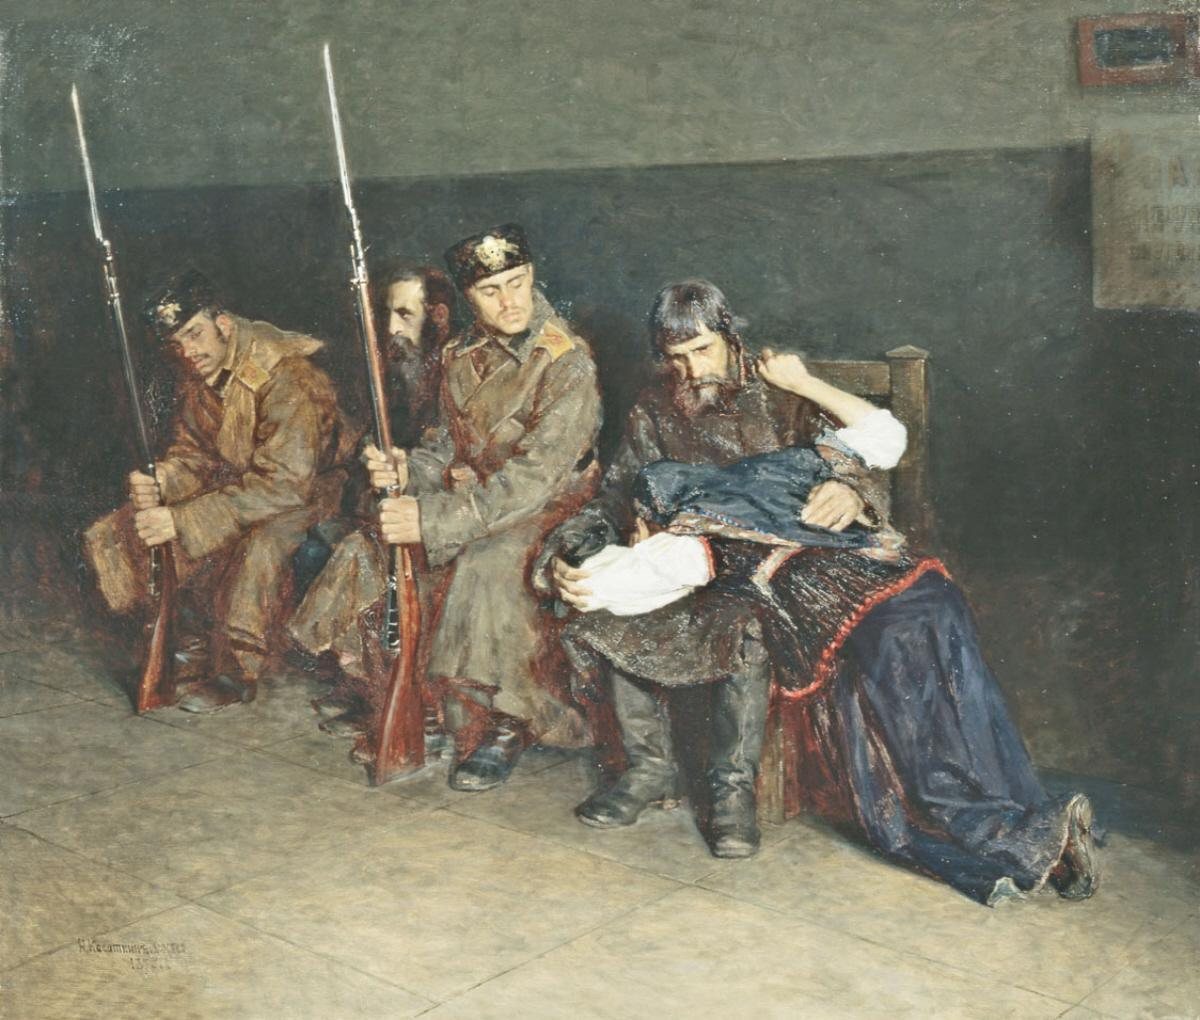 nikolai-kasatkin-in-the-anteroom-of-the-district-court-1897